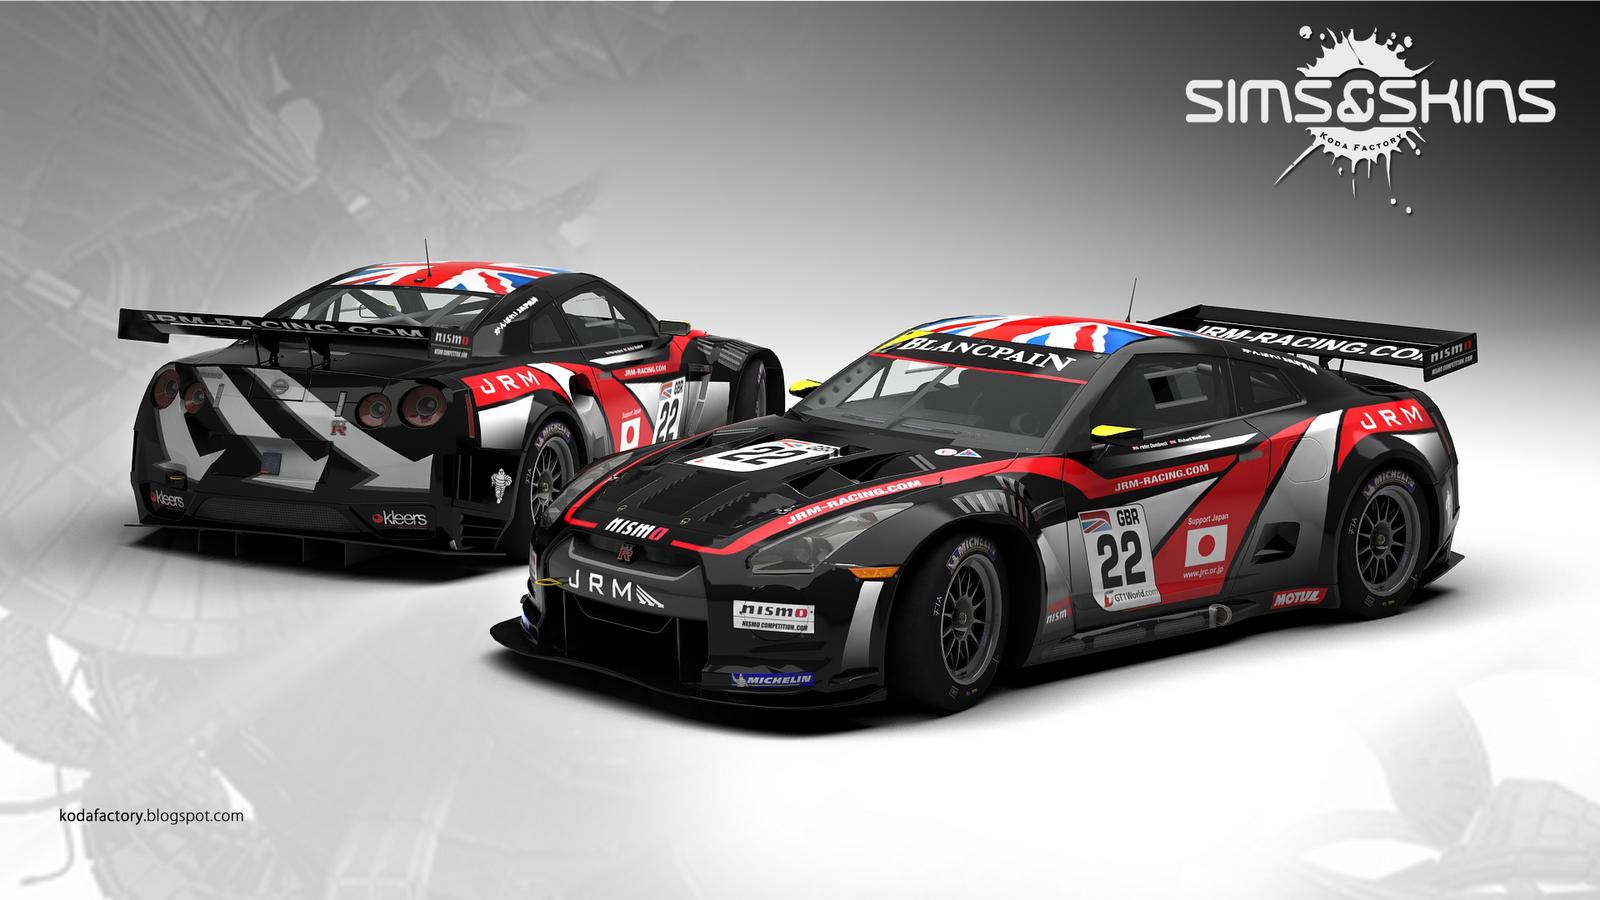 Koda Factory: JRMRacing : Nissan GTR GT1